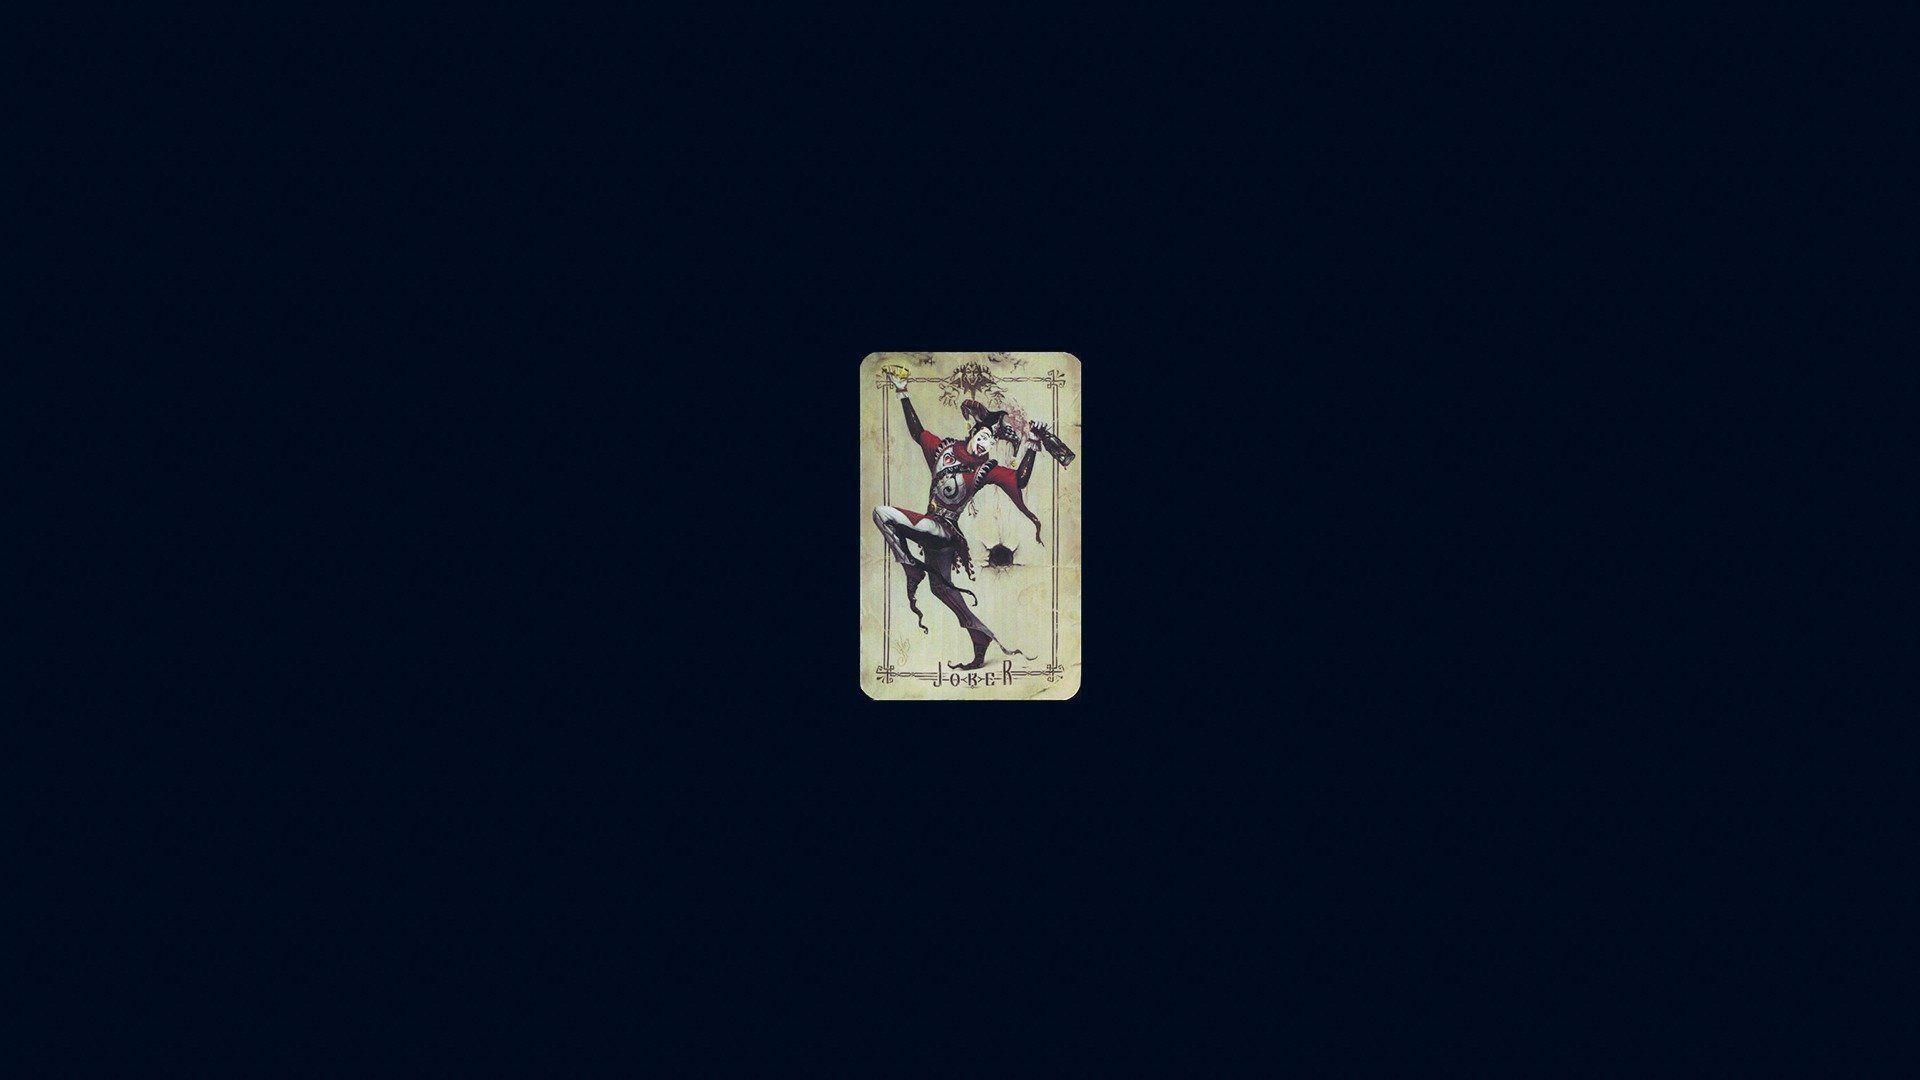 joker card wallpapers wallpaper cave